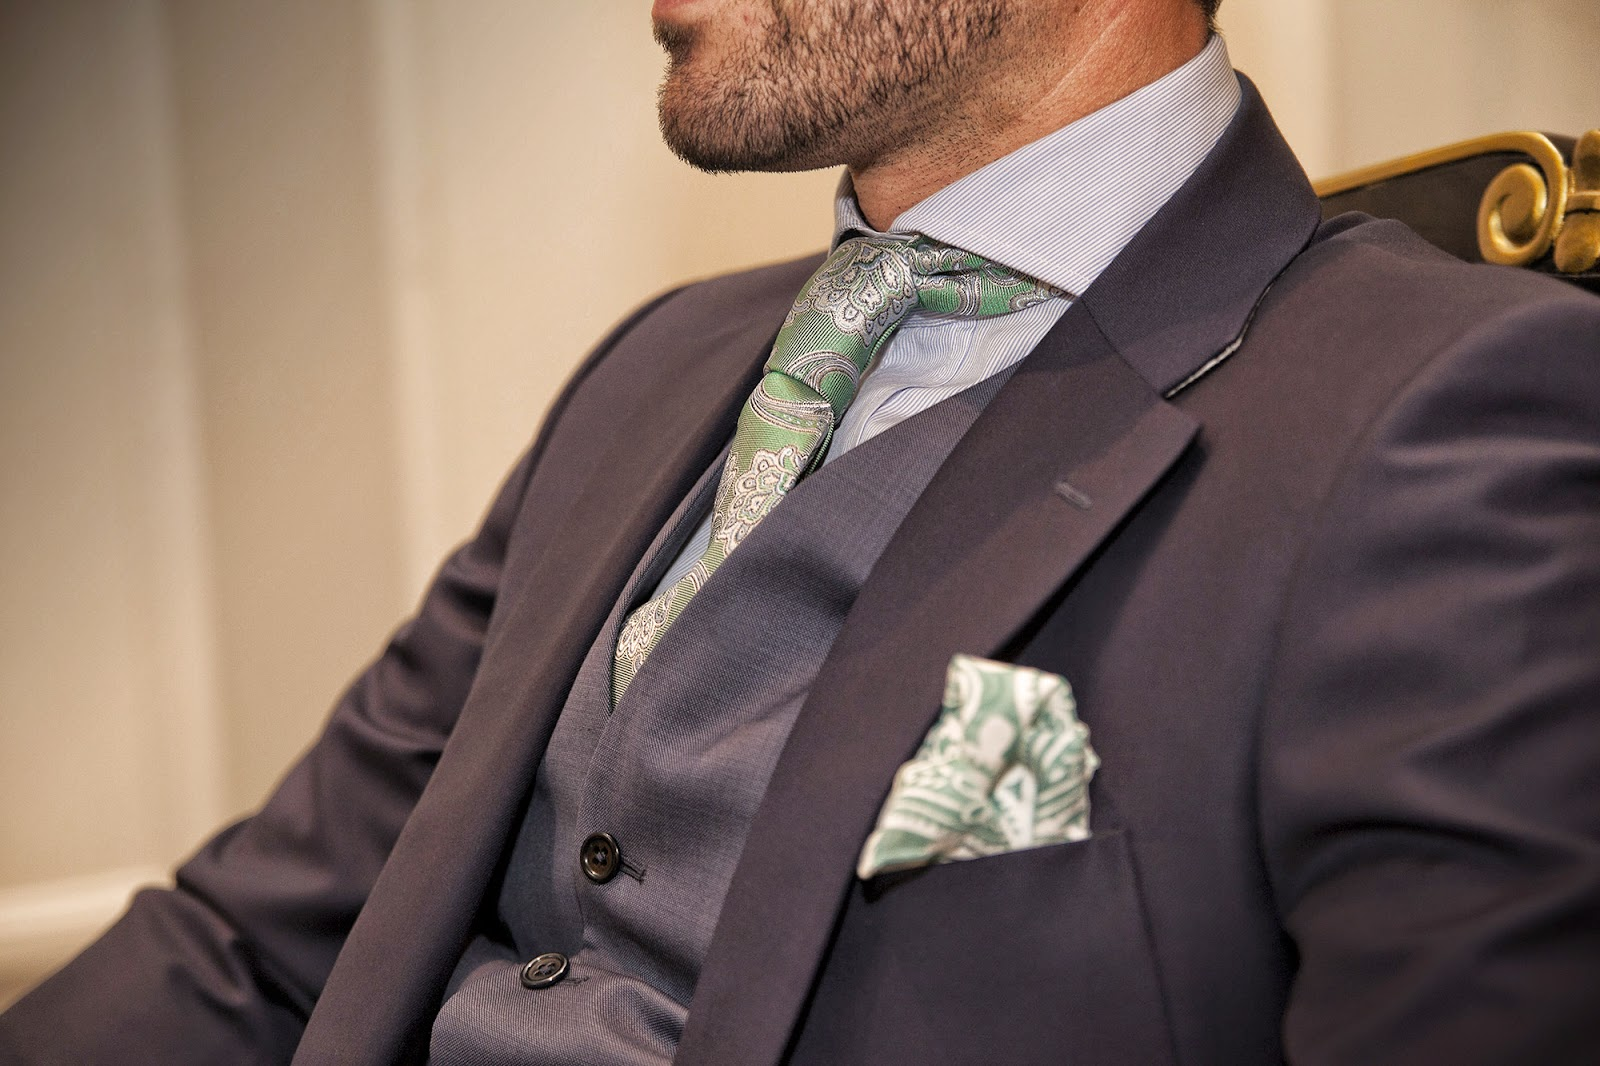 Haberdashers, Madrid, menswear, sastrería, Suits and Shirts, showroom, Fall 2014, tweed,